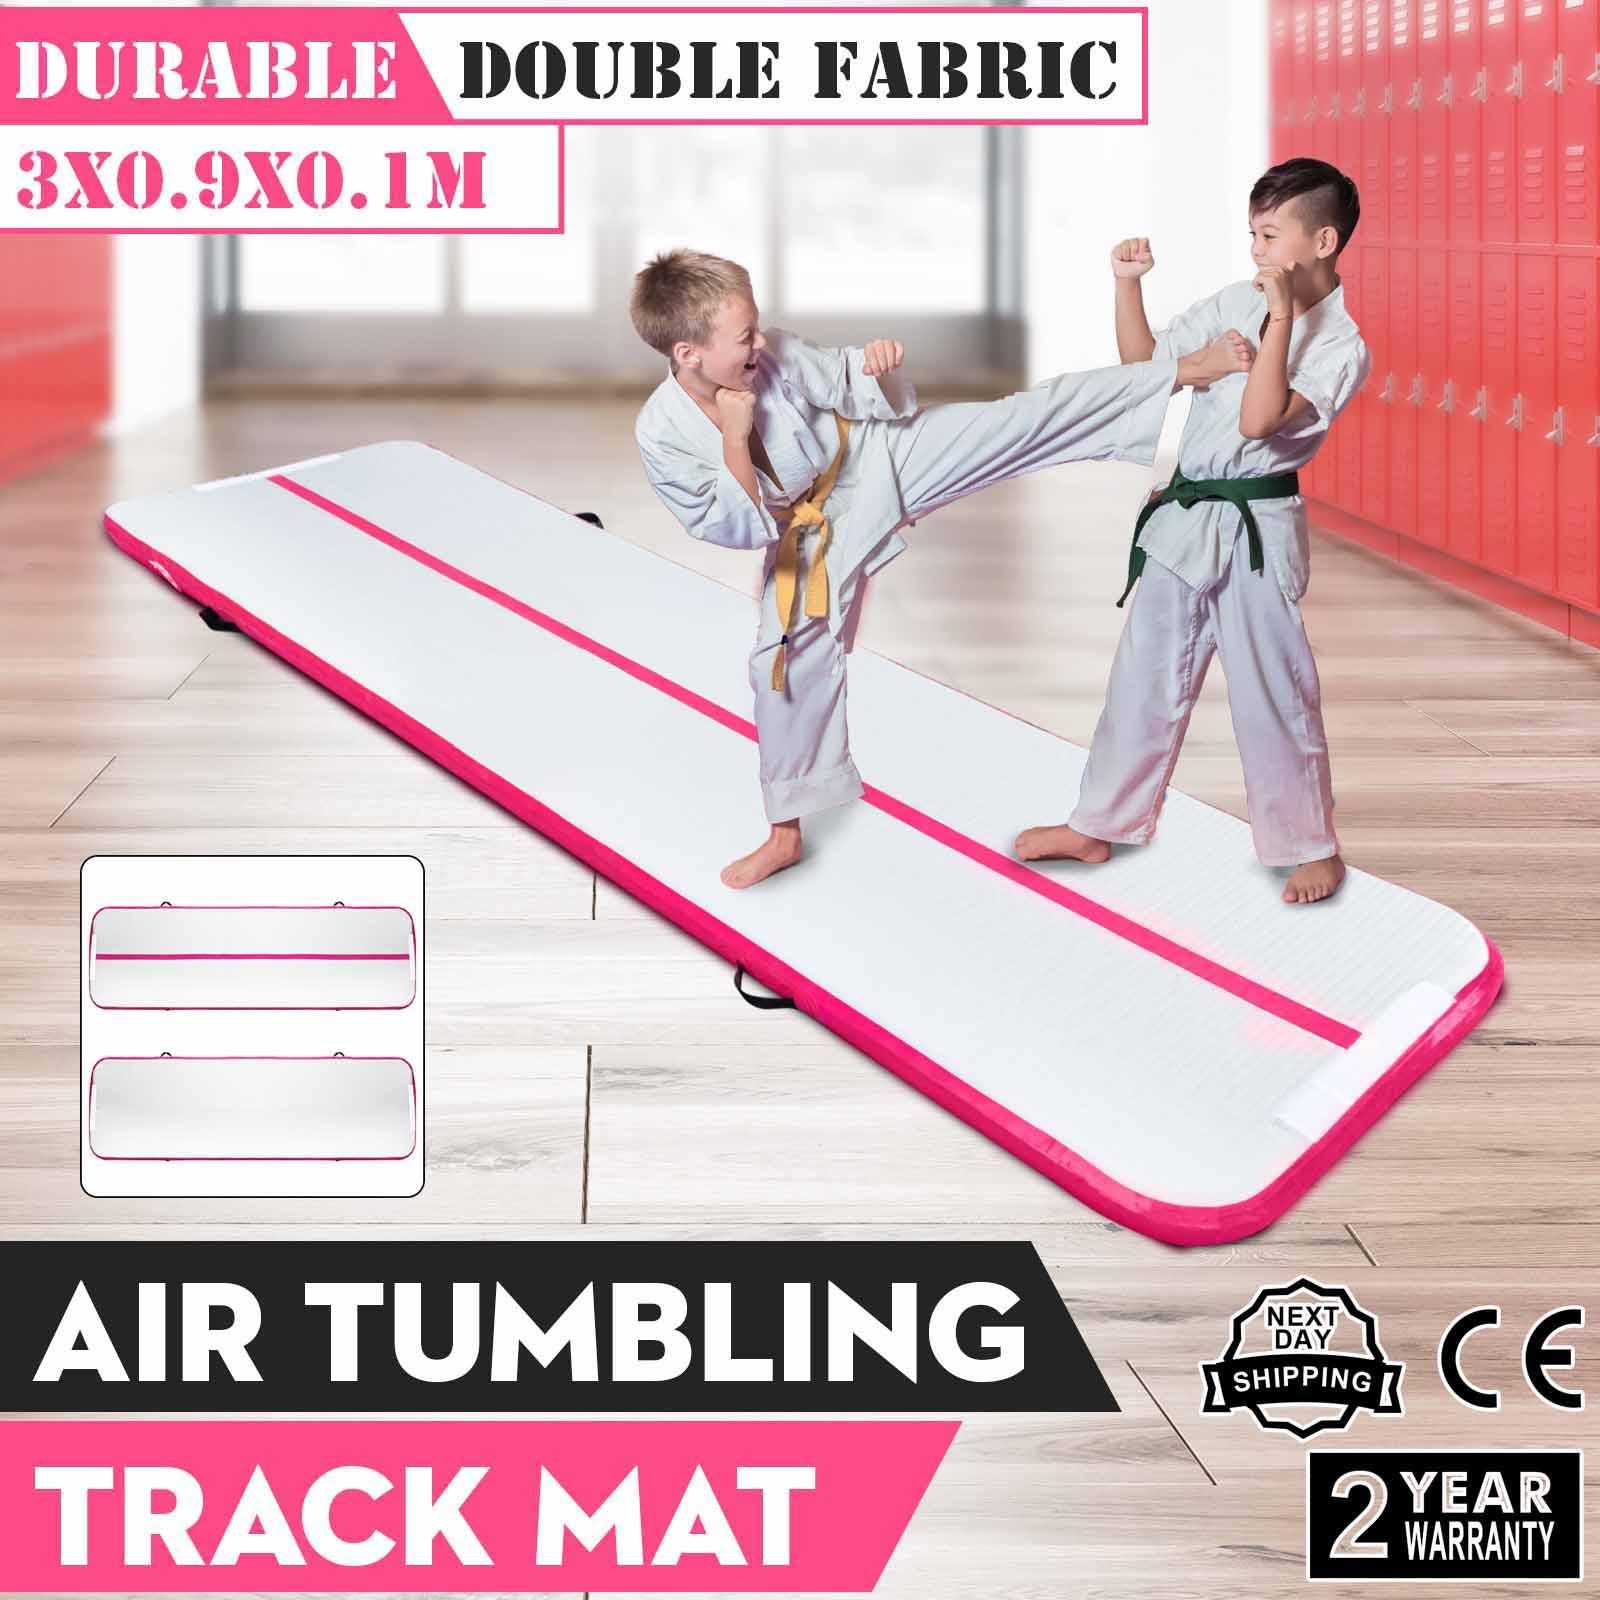 3m air track aufblasbare gymnastikmatte tumbling matte. Black Bedroom Furniture Sets. Home Design Ideas